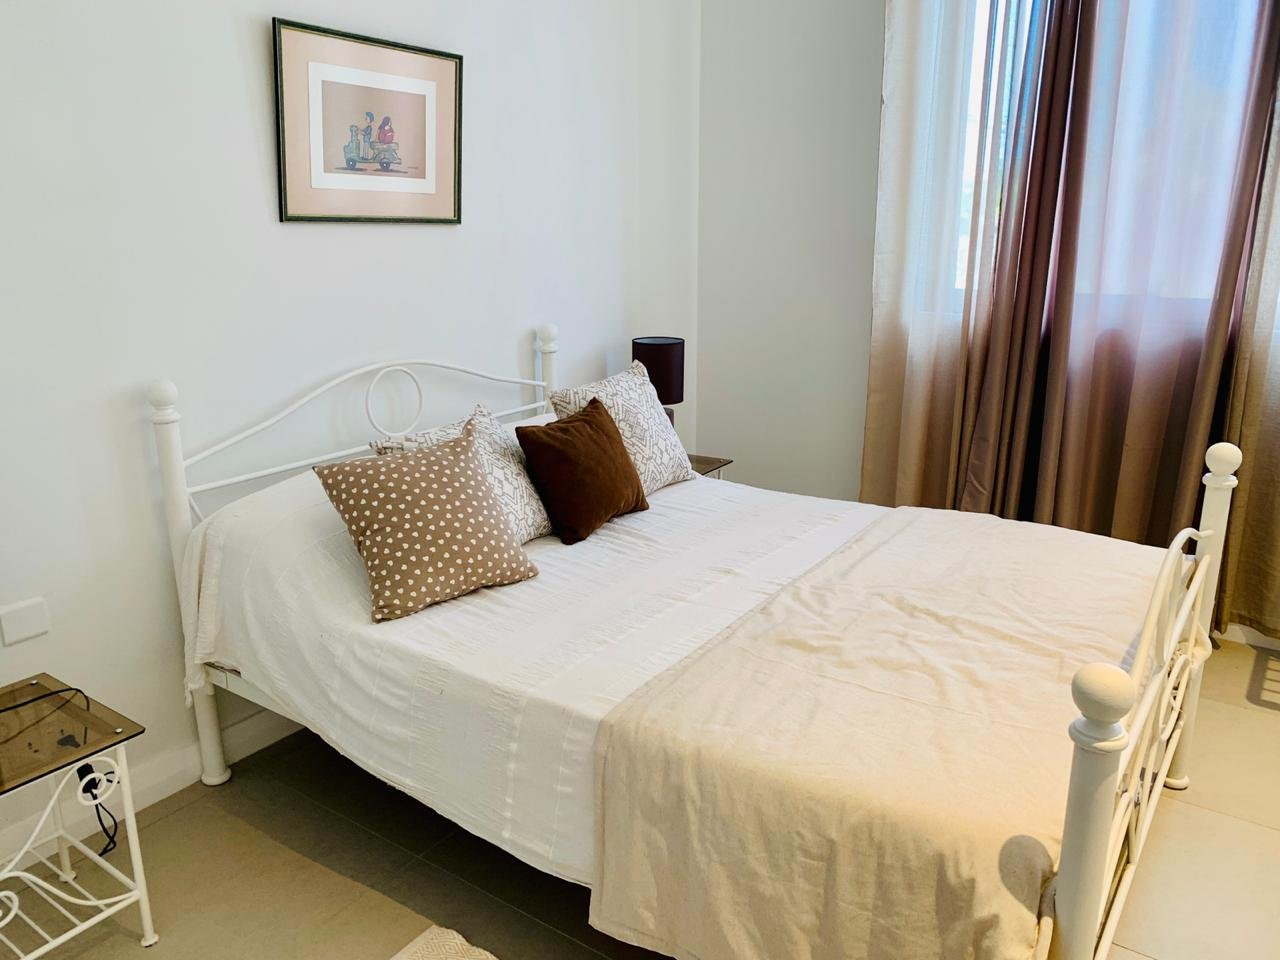 Location Appartement 2 chambres Pointe aux Biches/ Pamplemousses